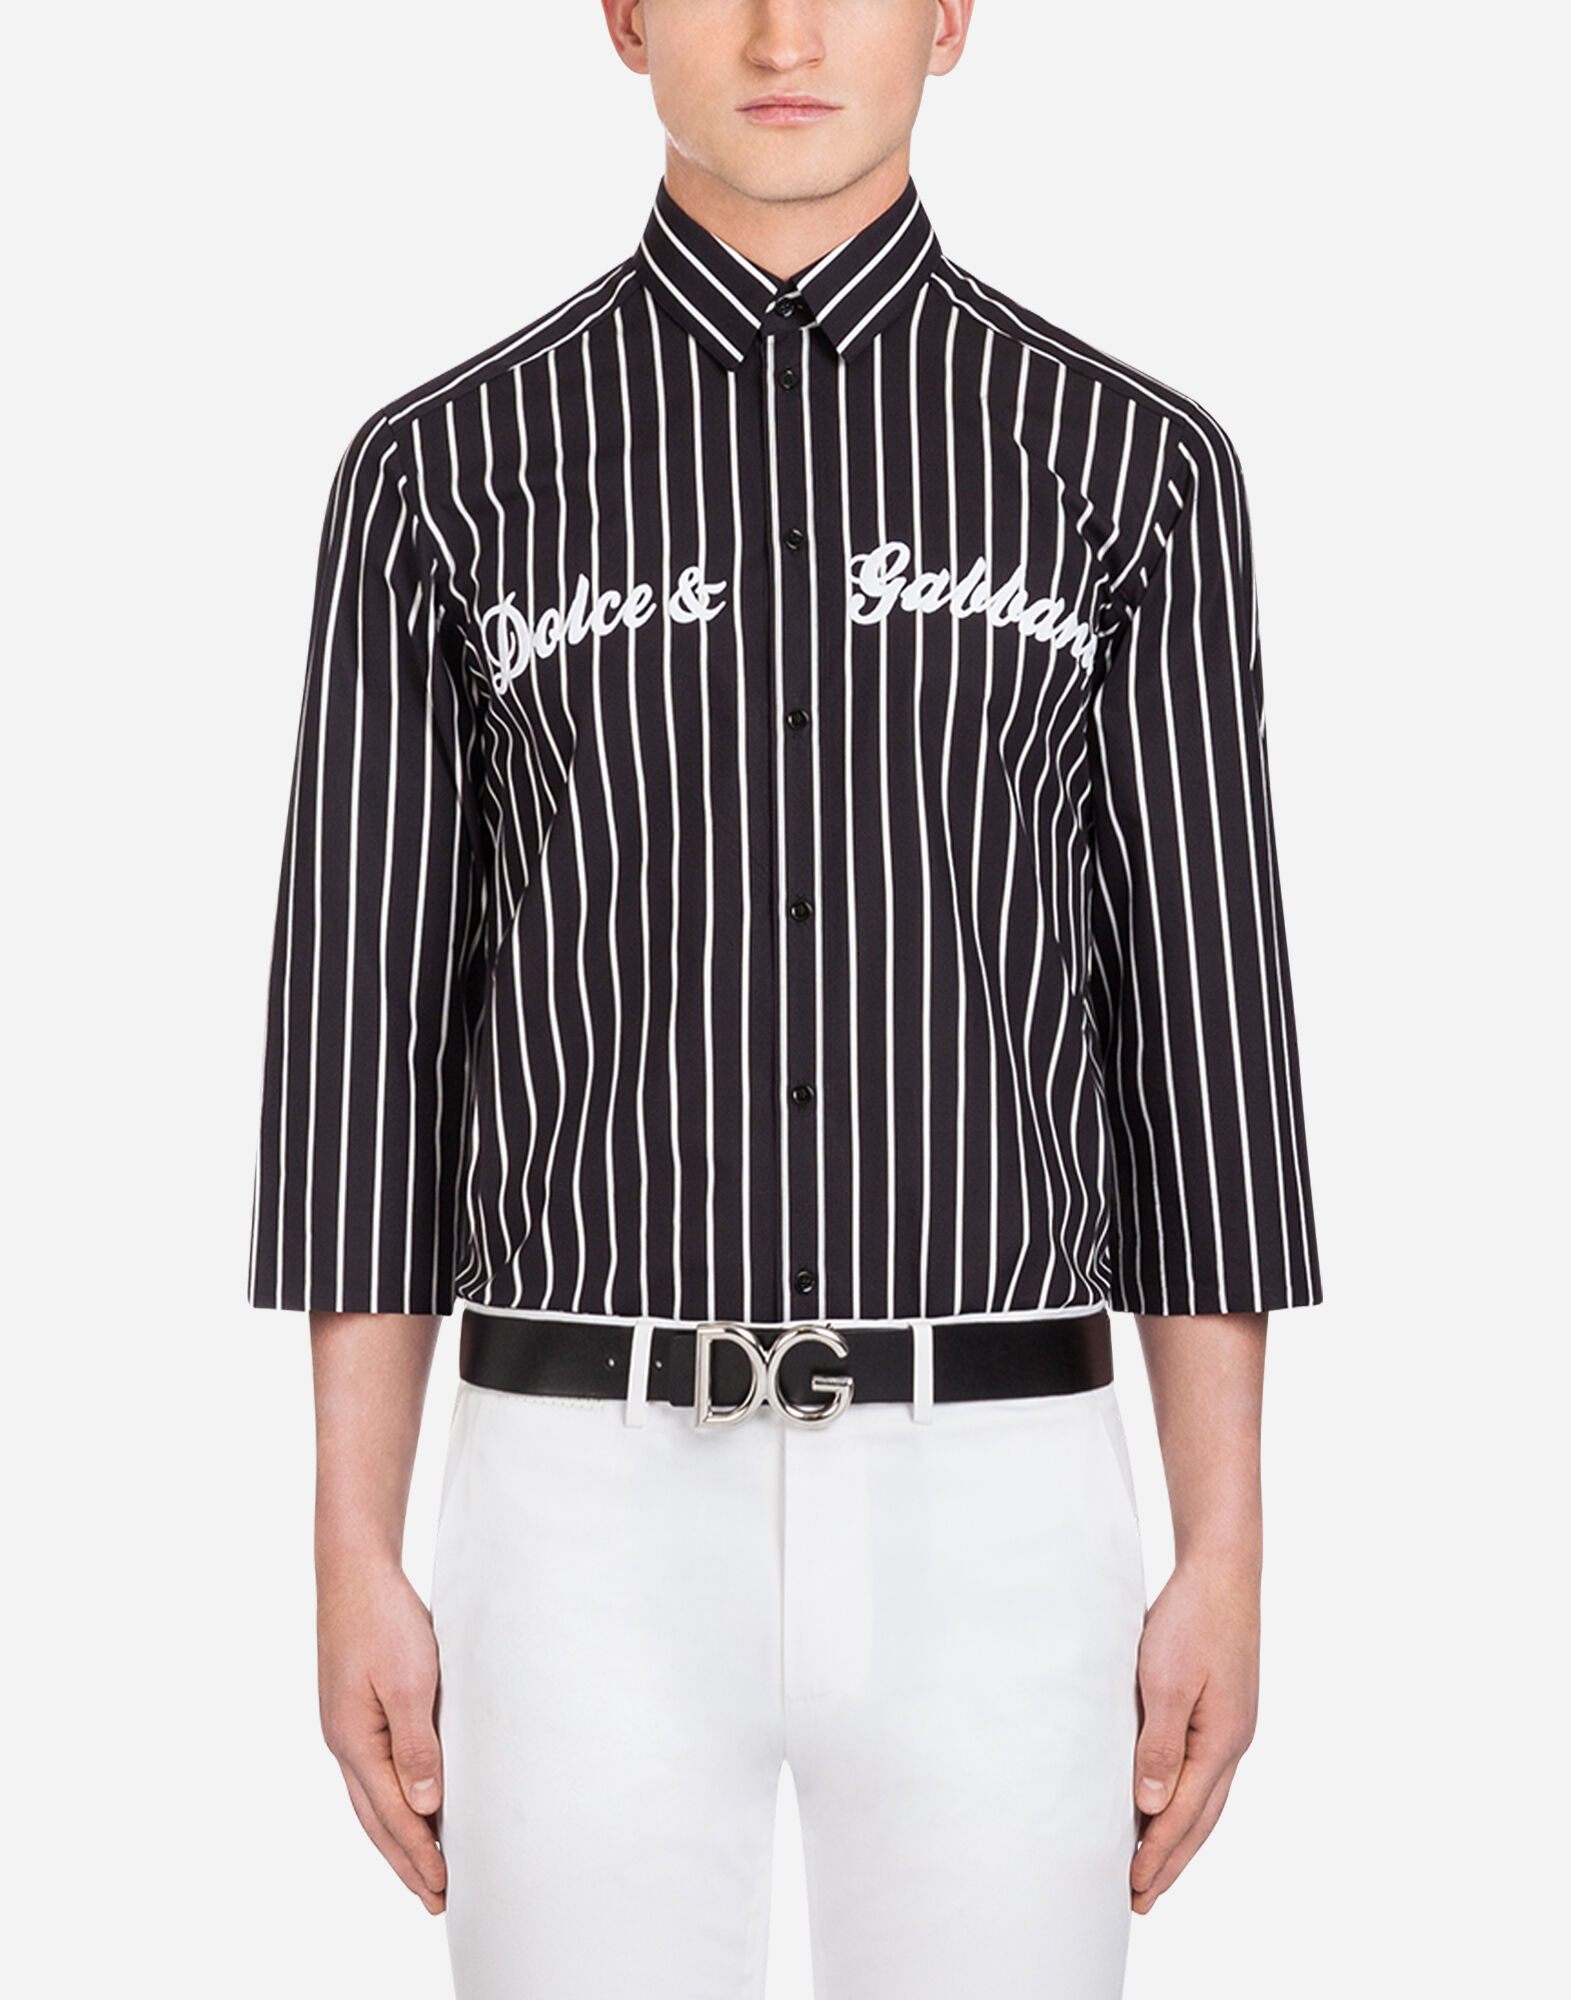 Slim-fit Logo-print Striped Cotton-poplin Shirt Dolce & Gabbana Outlet Wholesale Price myUzdJA